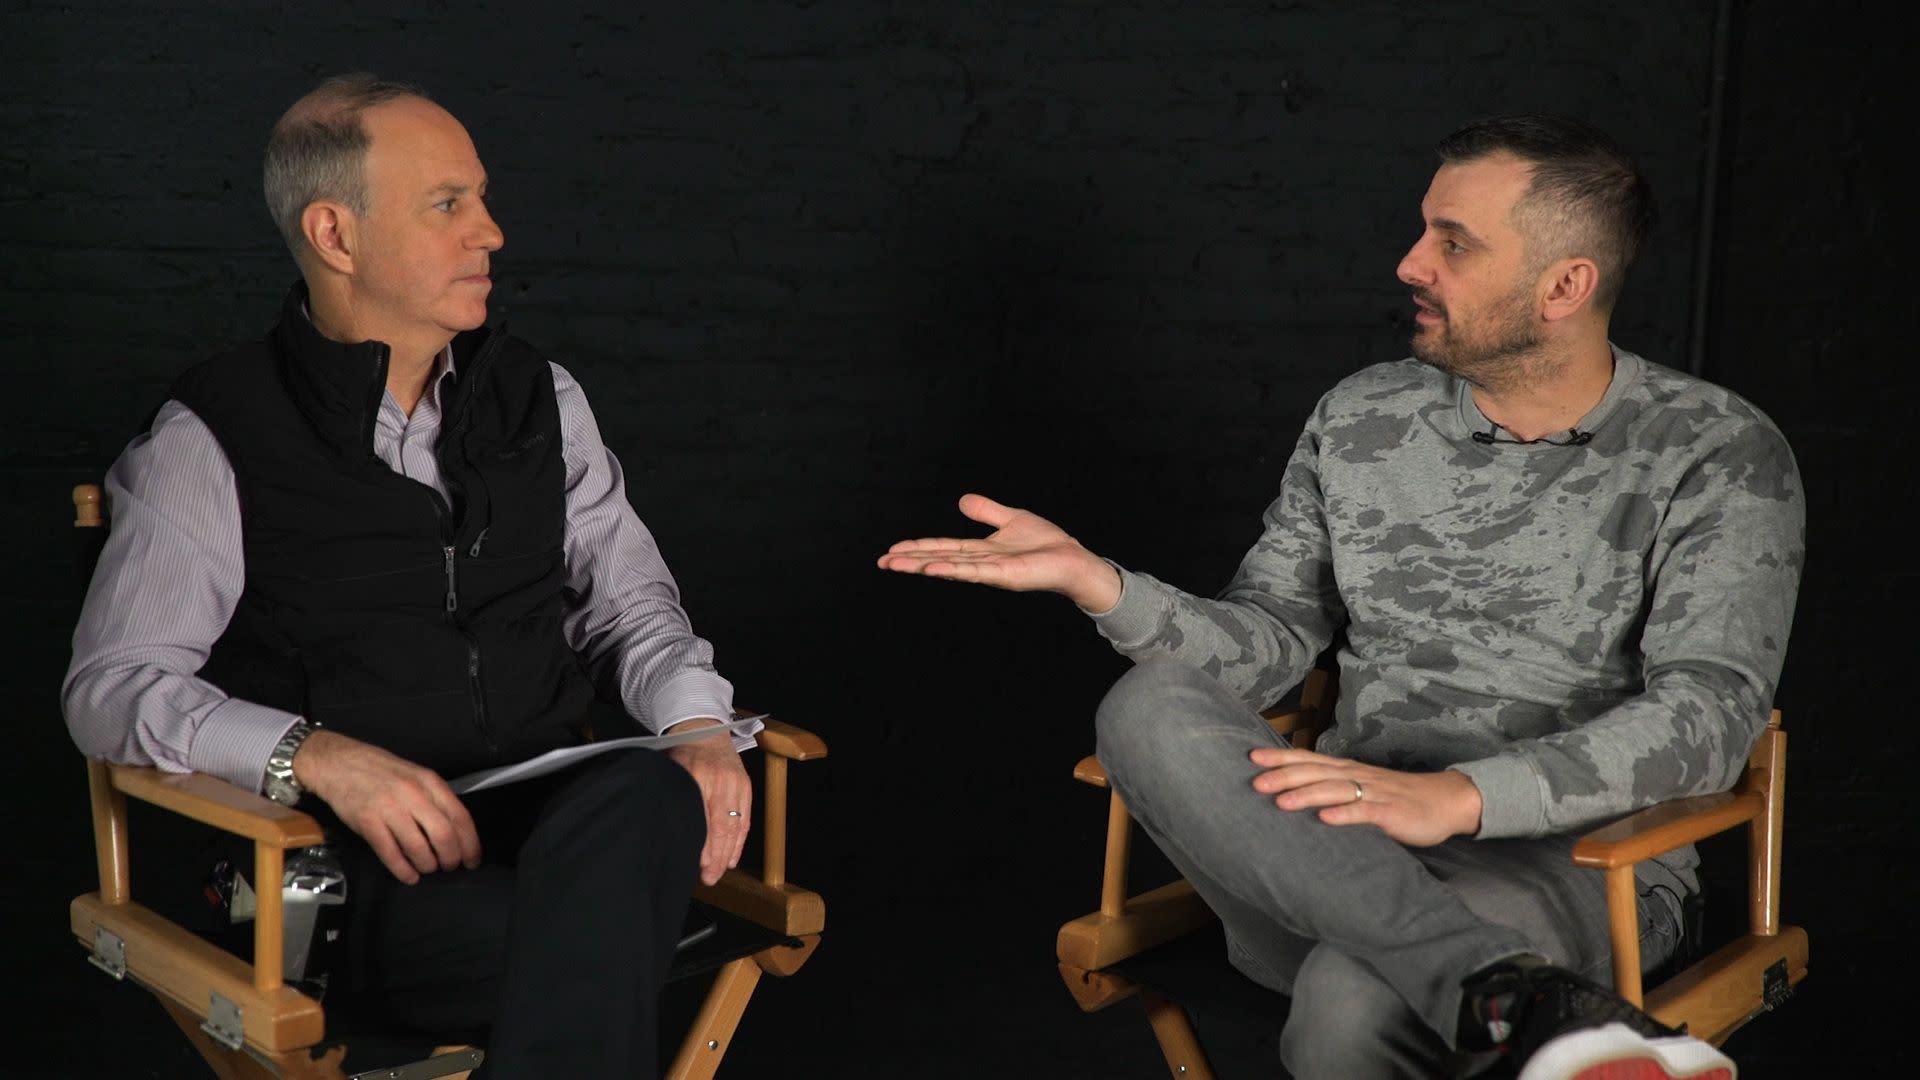 Influencers Transcript: Gary Vaynerchuk, April 11, 2019